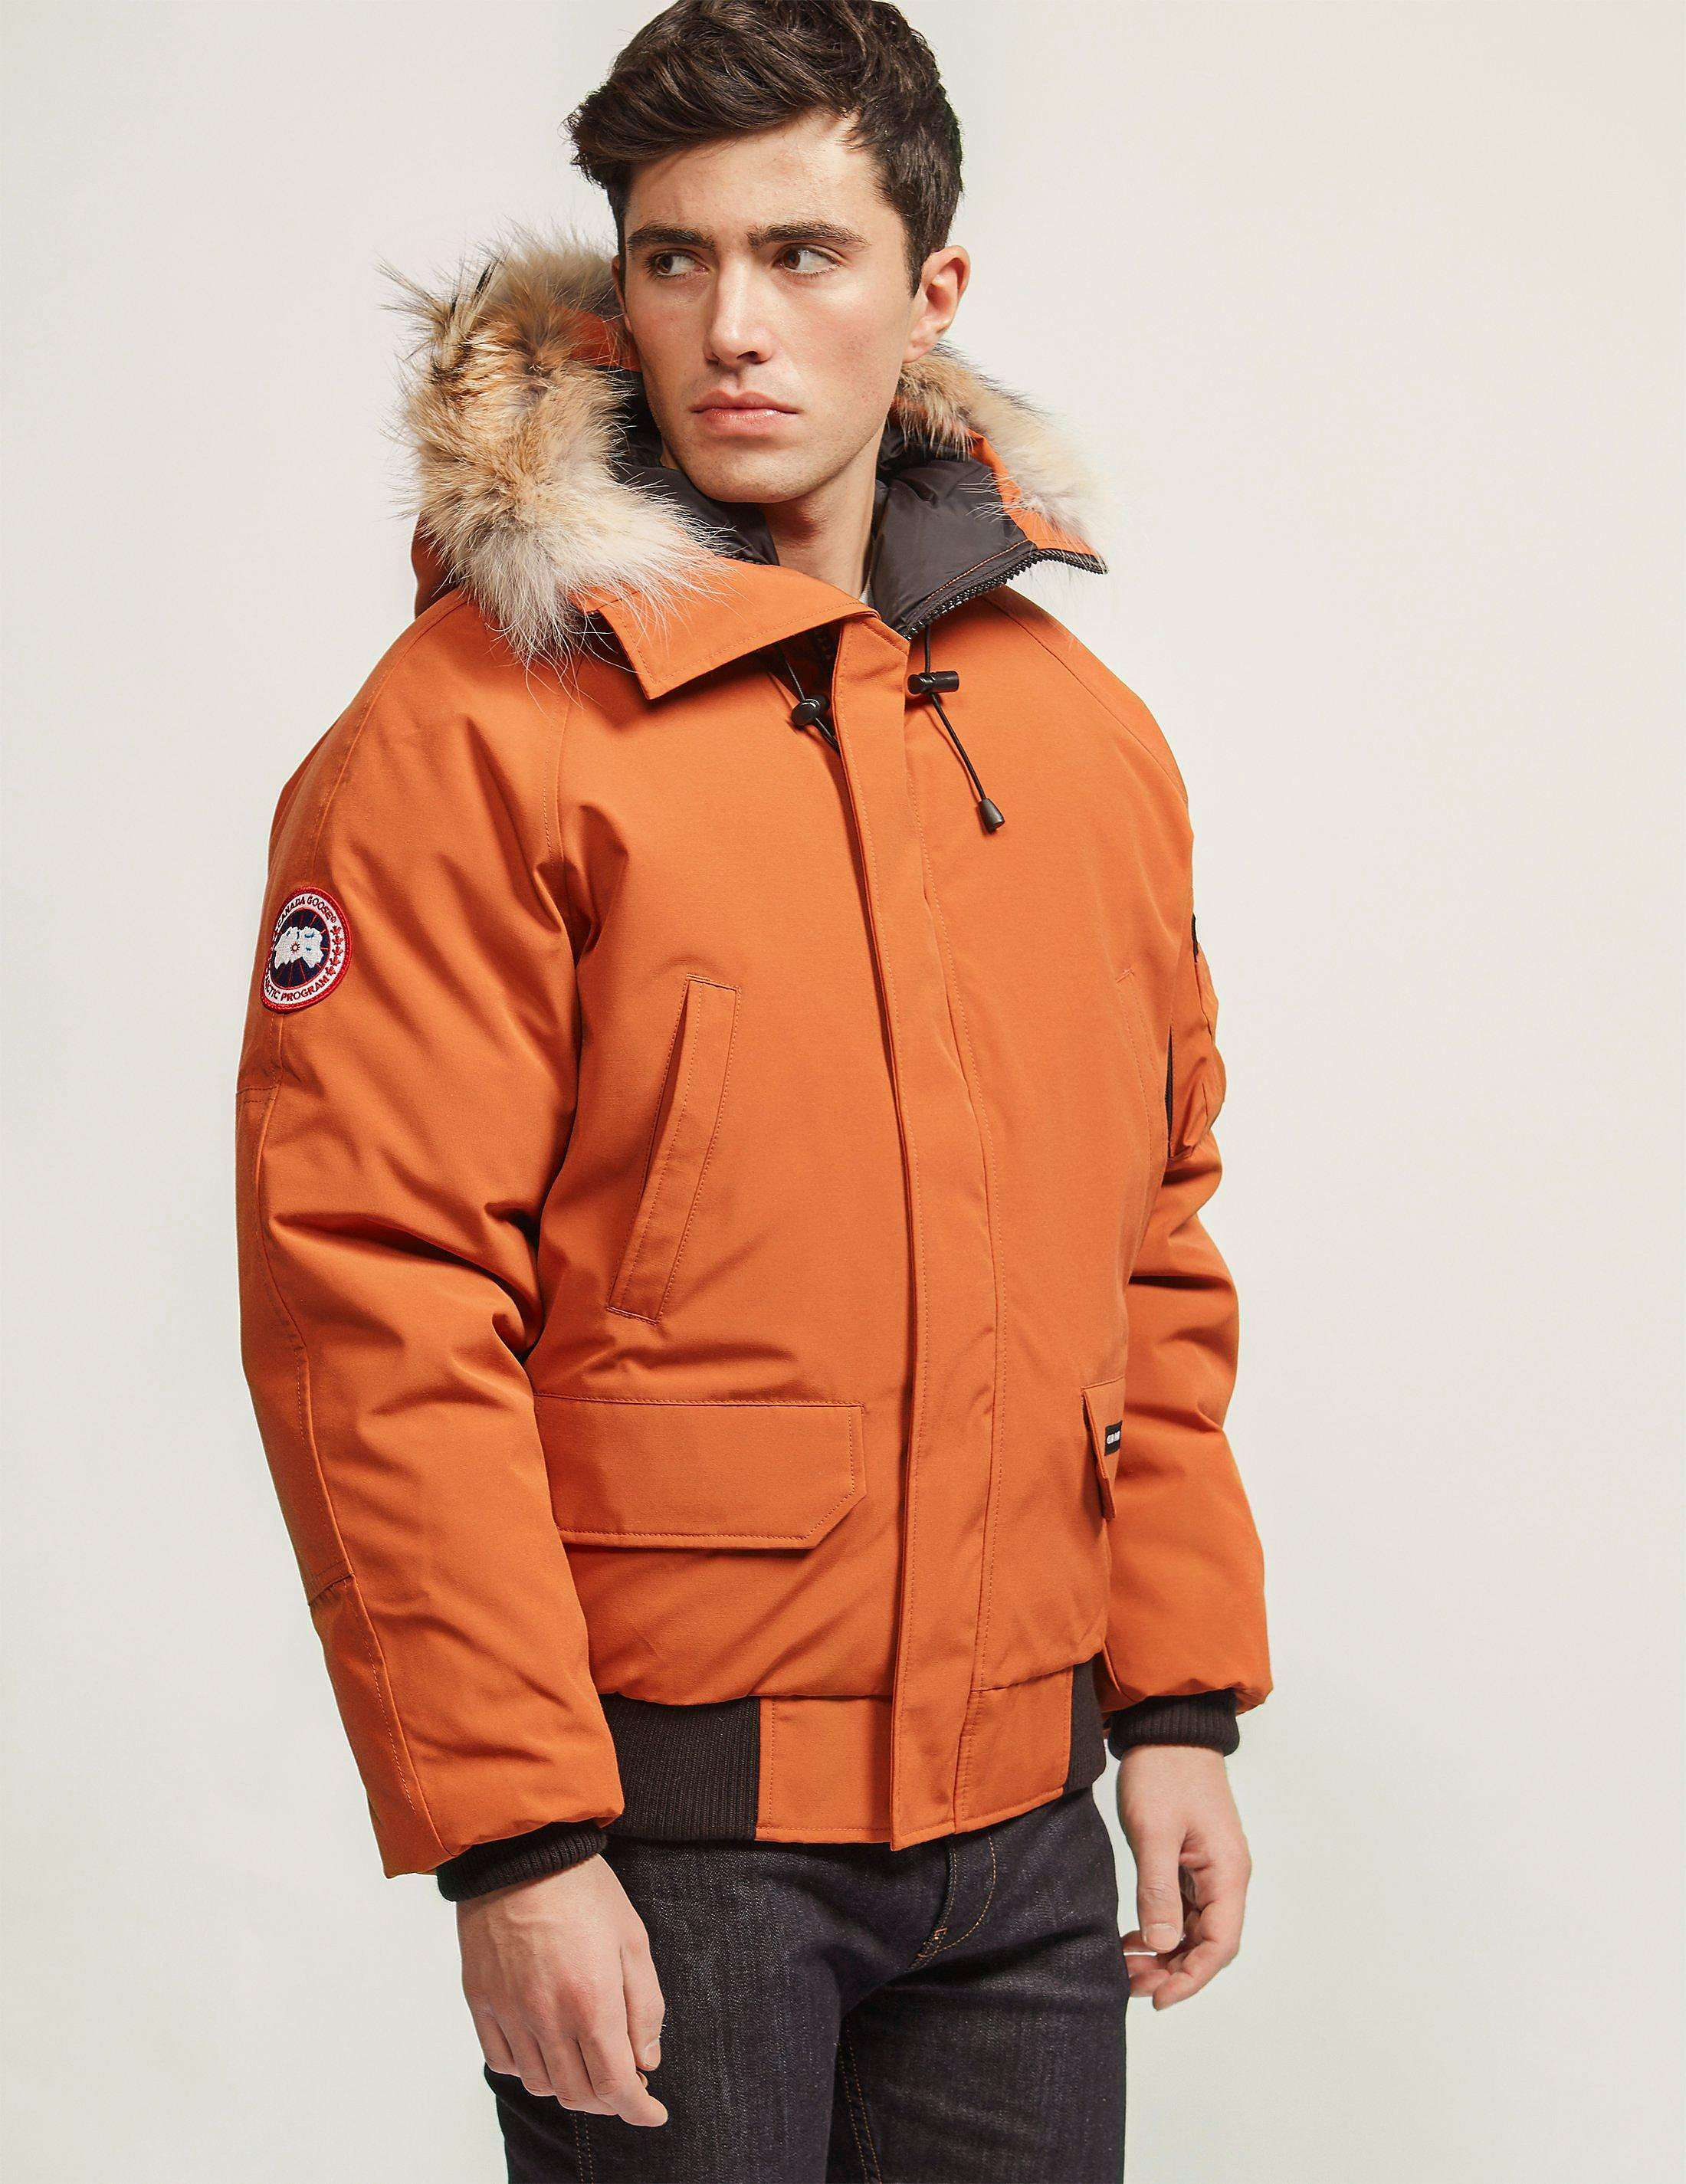 canada goose bomber jacket price